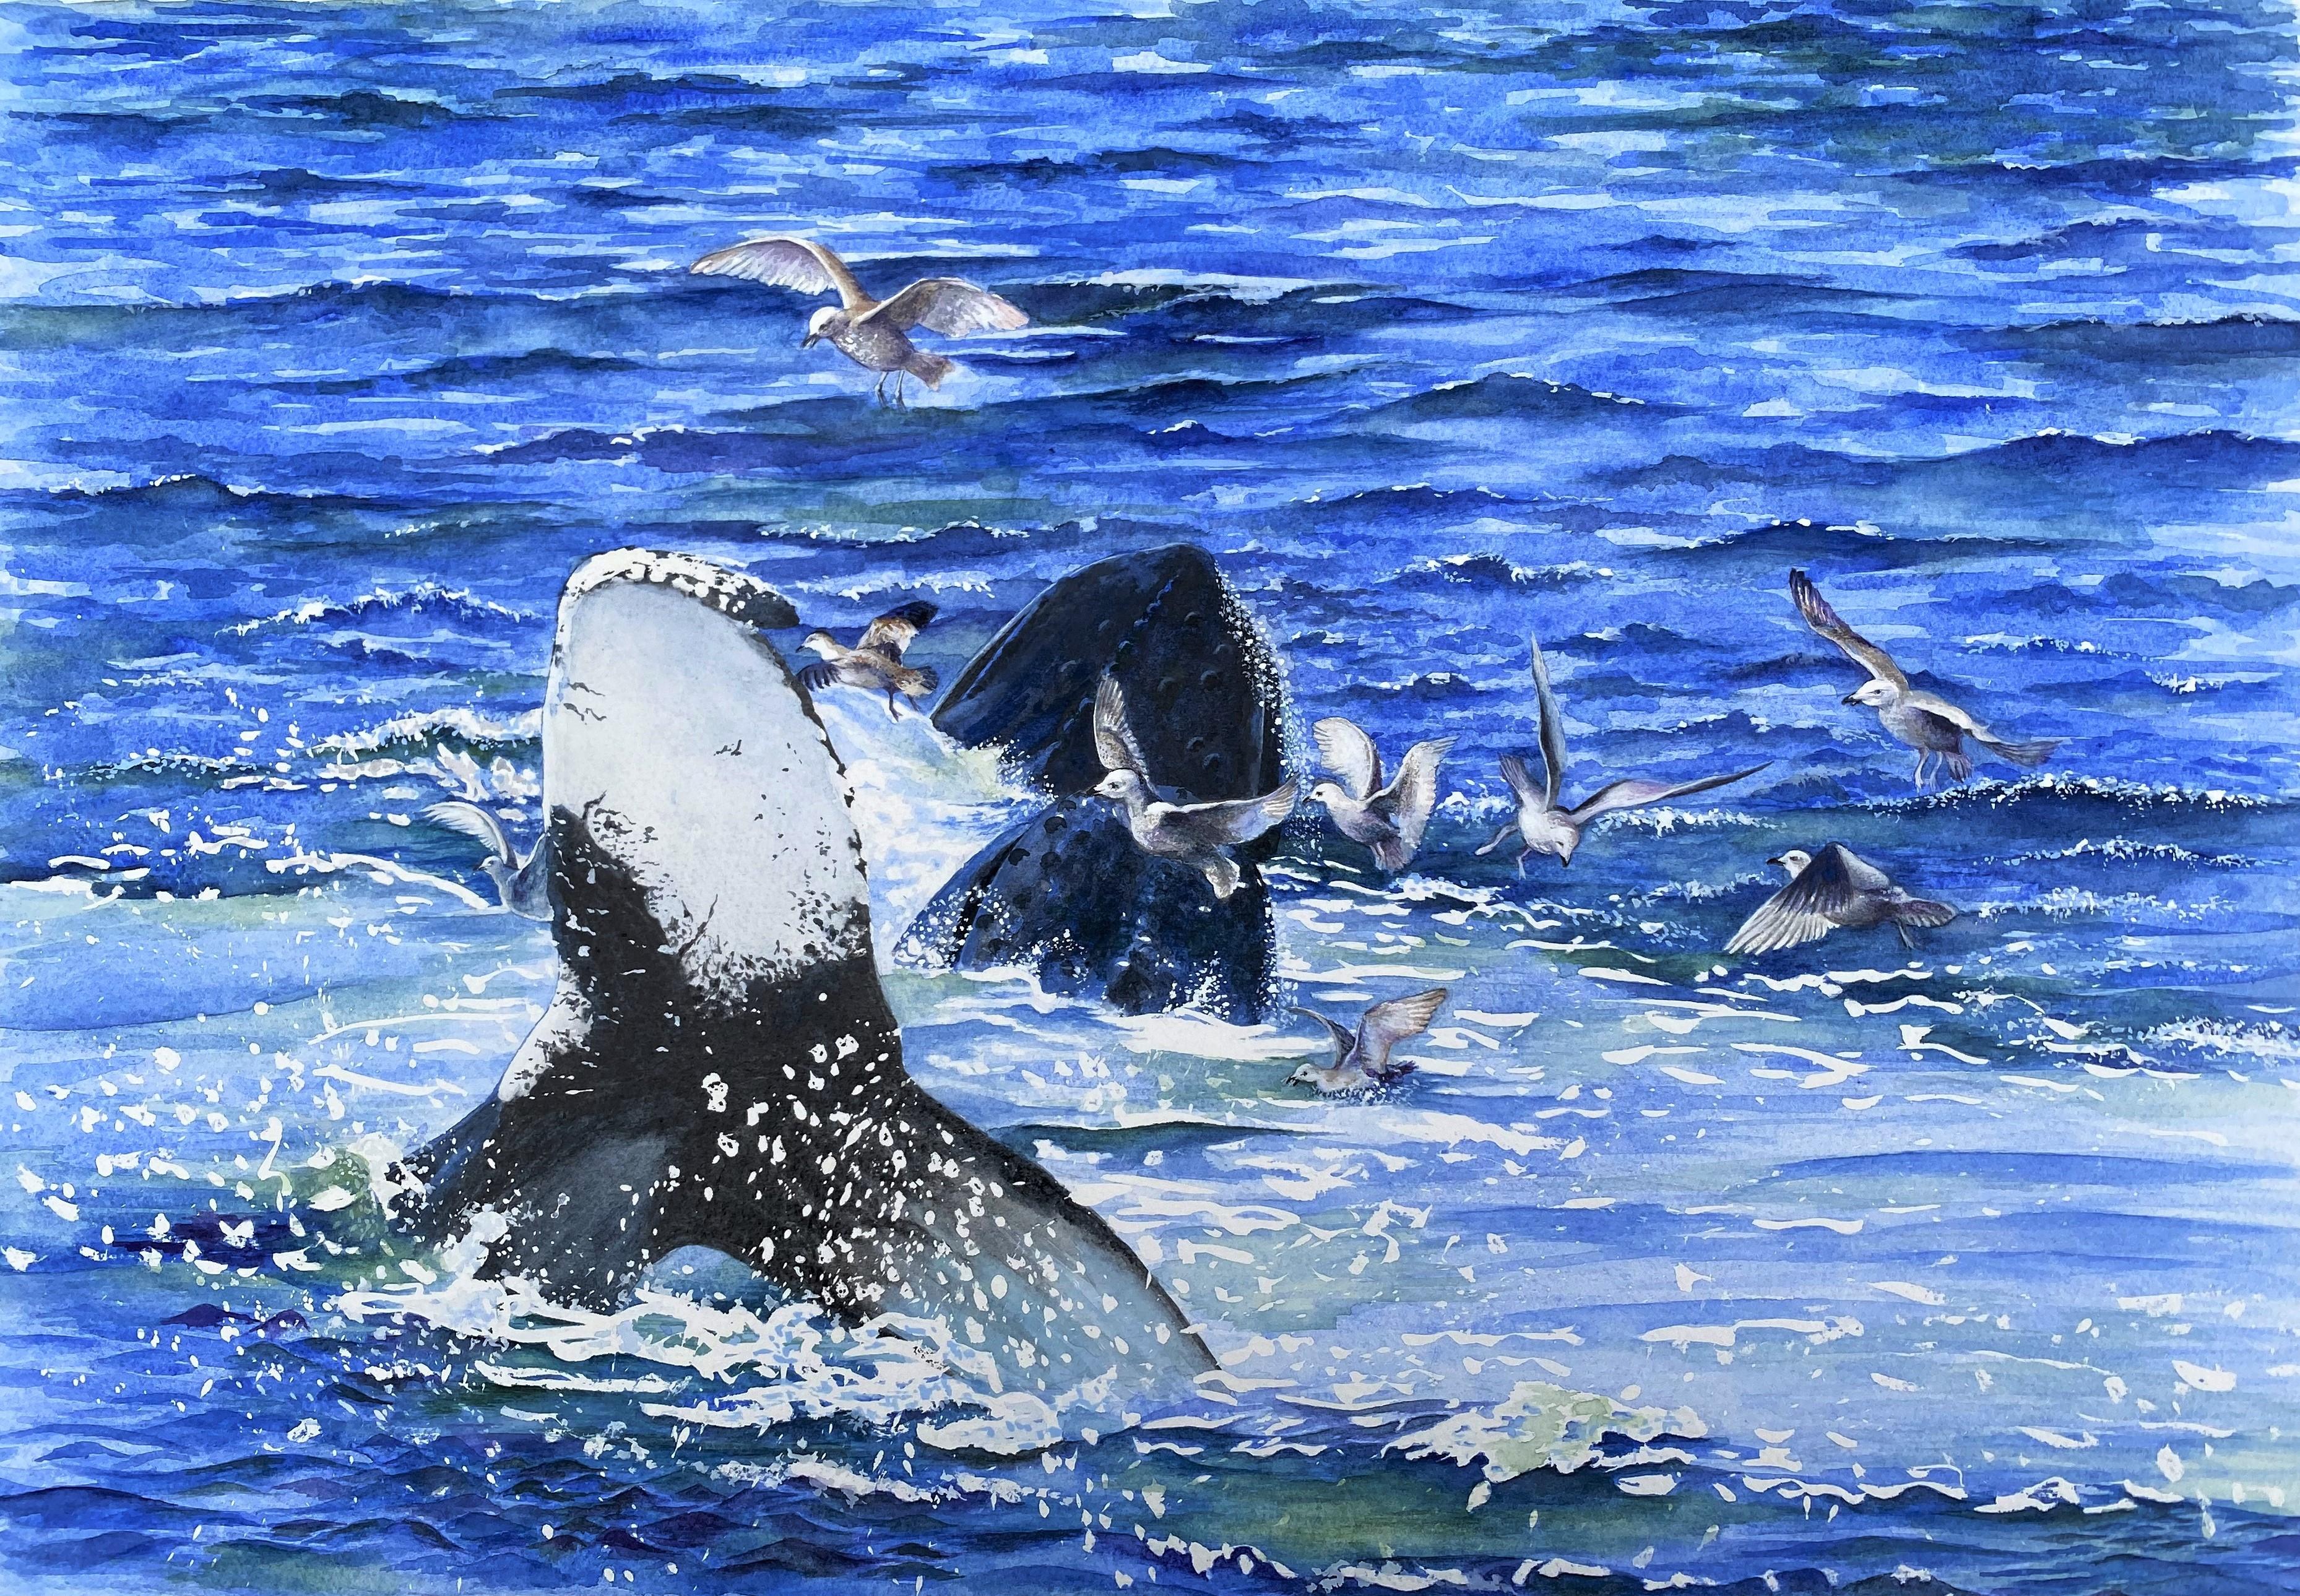 Whales Feeding off Barnstable, MA